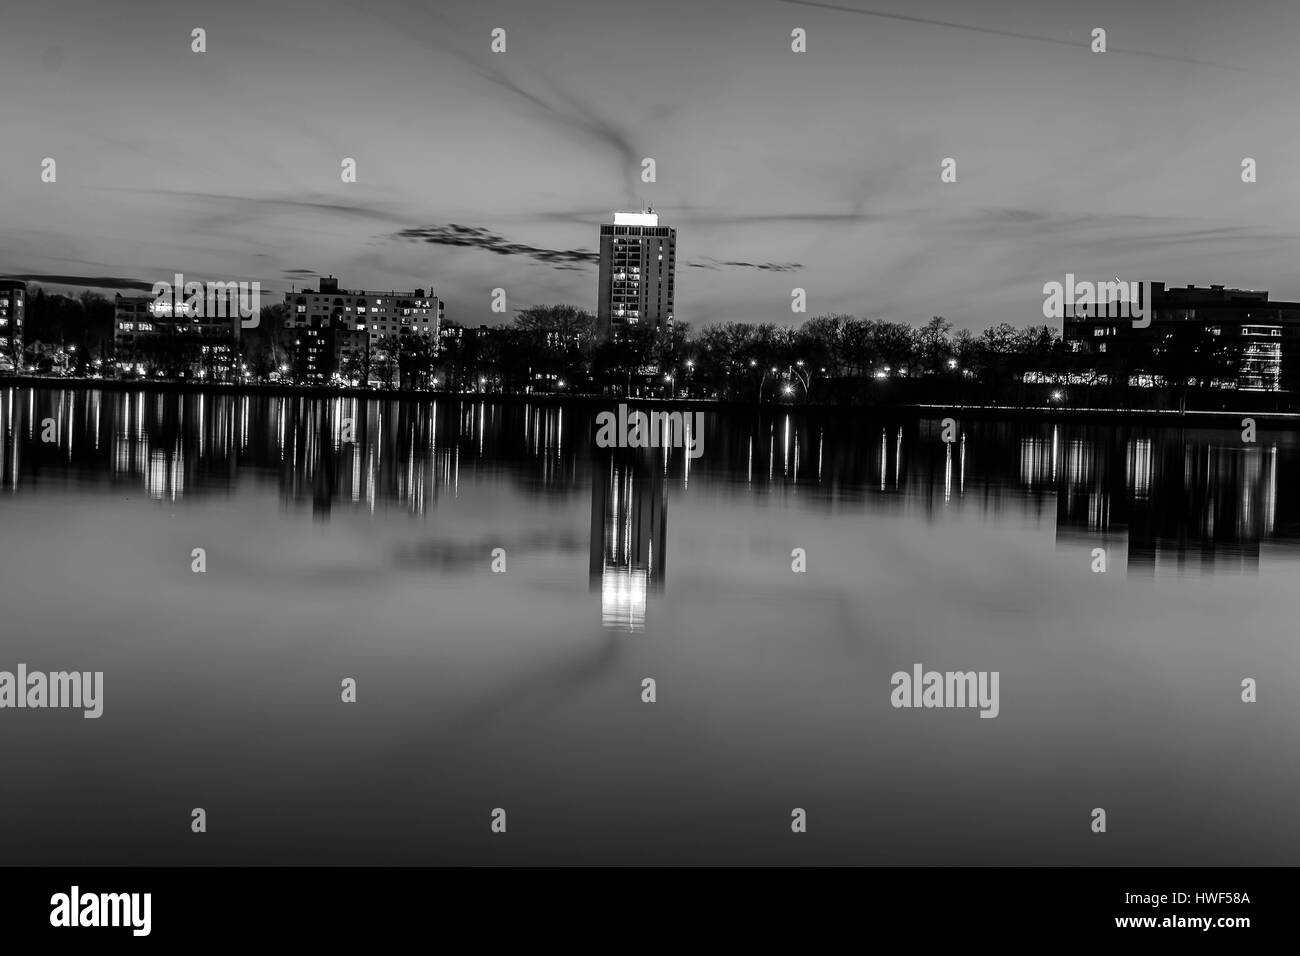 Minneapolis cityscape at night. - Stock Image